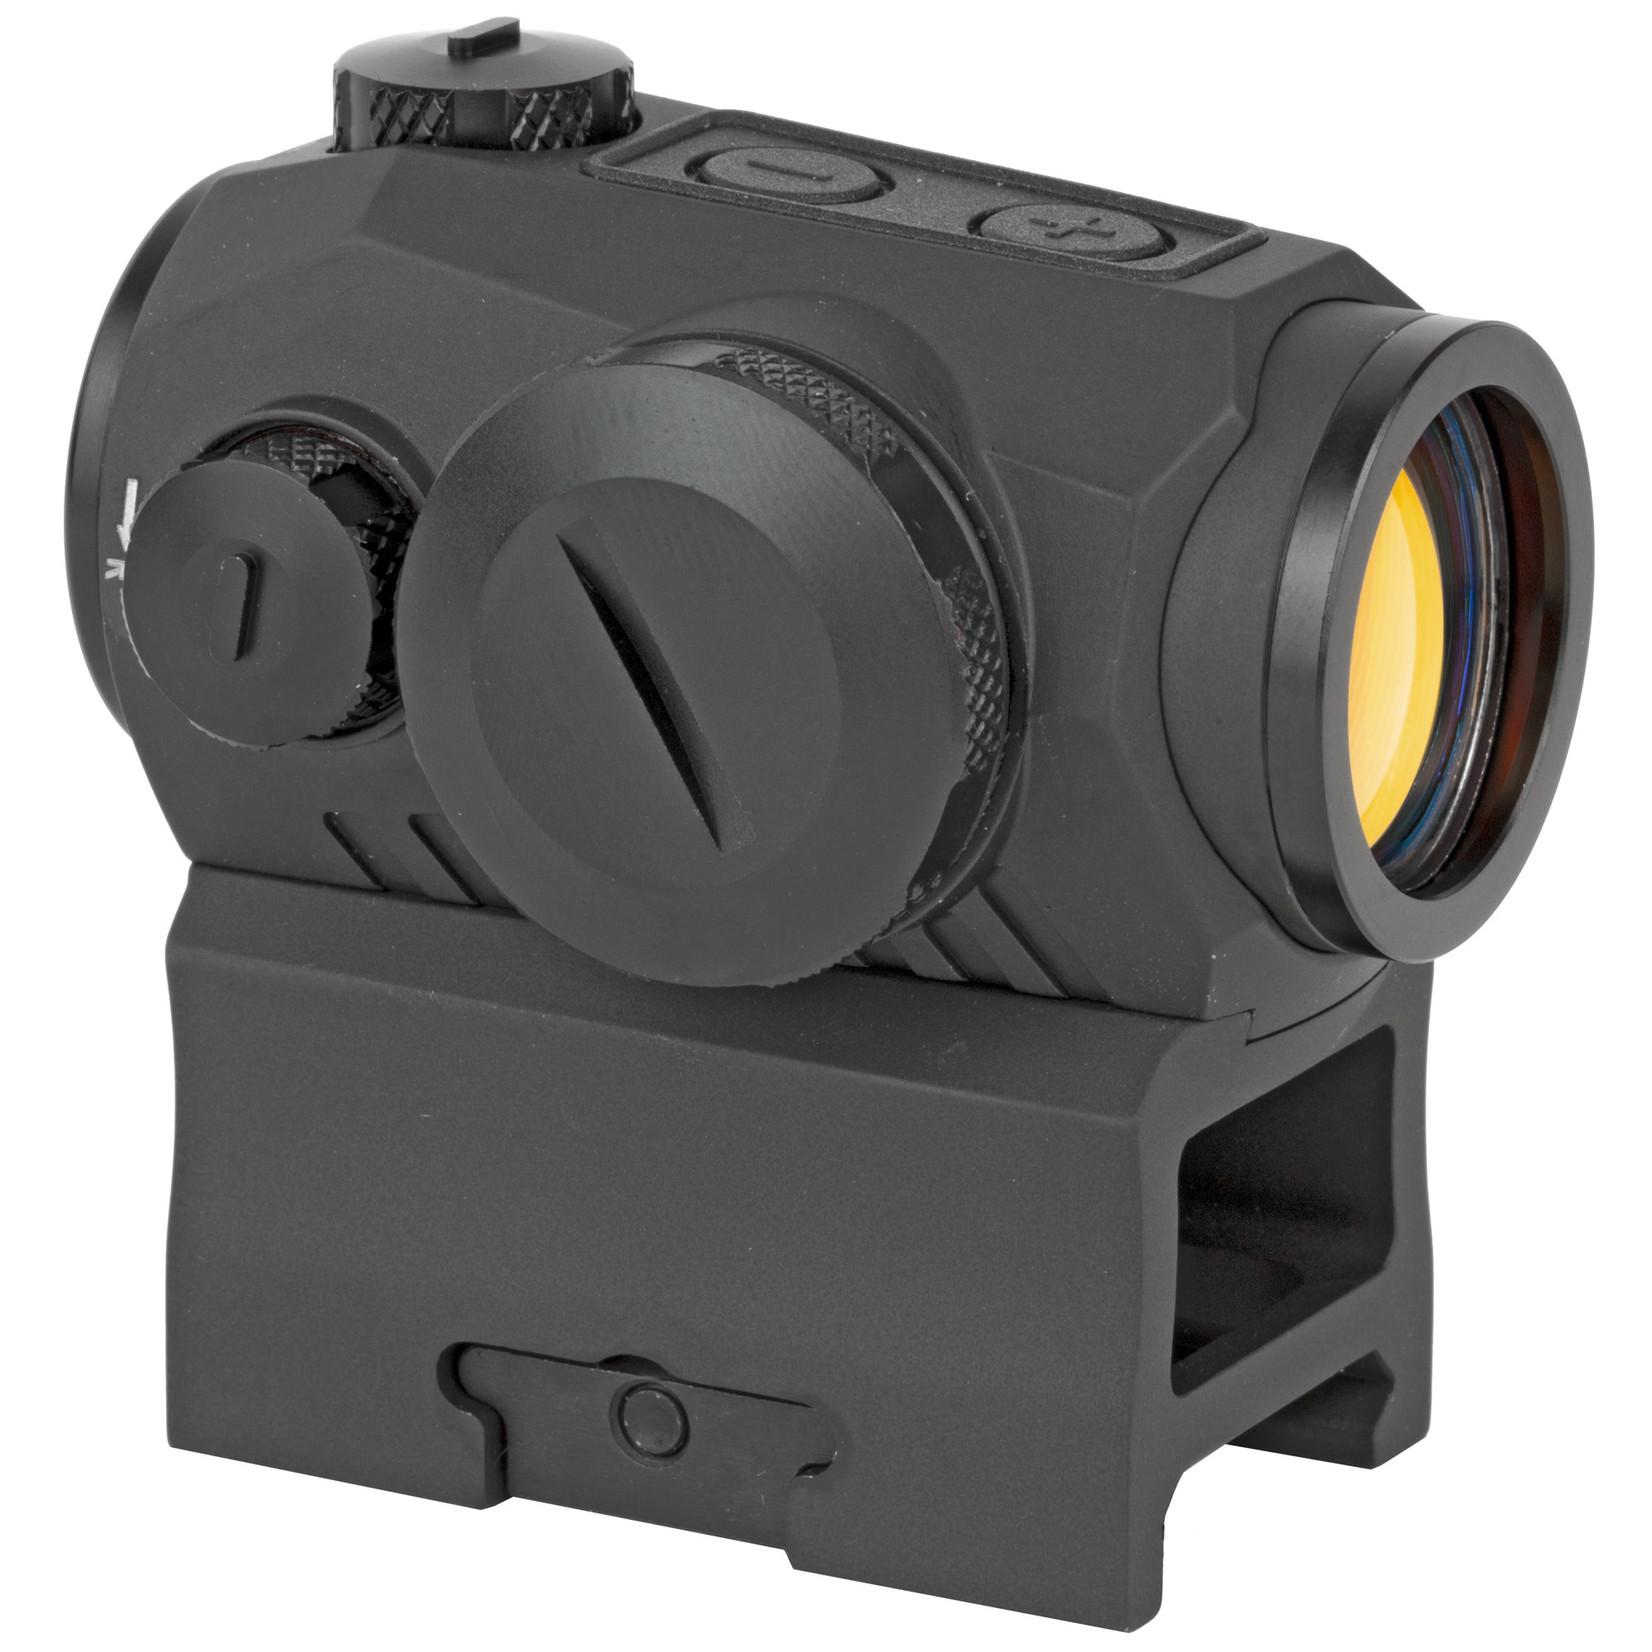 SIG SAUER Sig Sauer ROMEO5 Compact Red Dot 1x20mm 2MOA .5MOA Adj M1913 Black - White BX